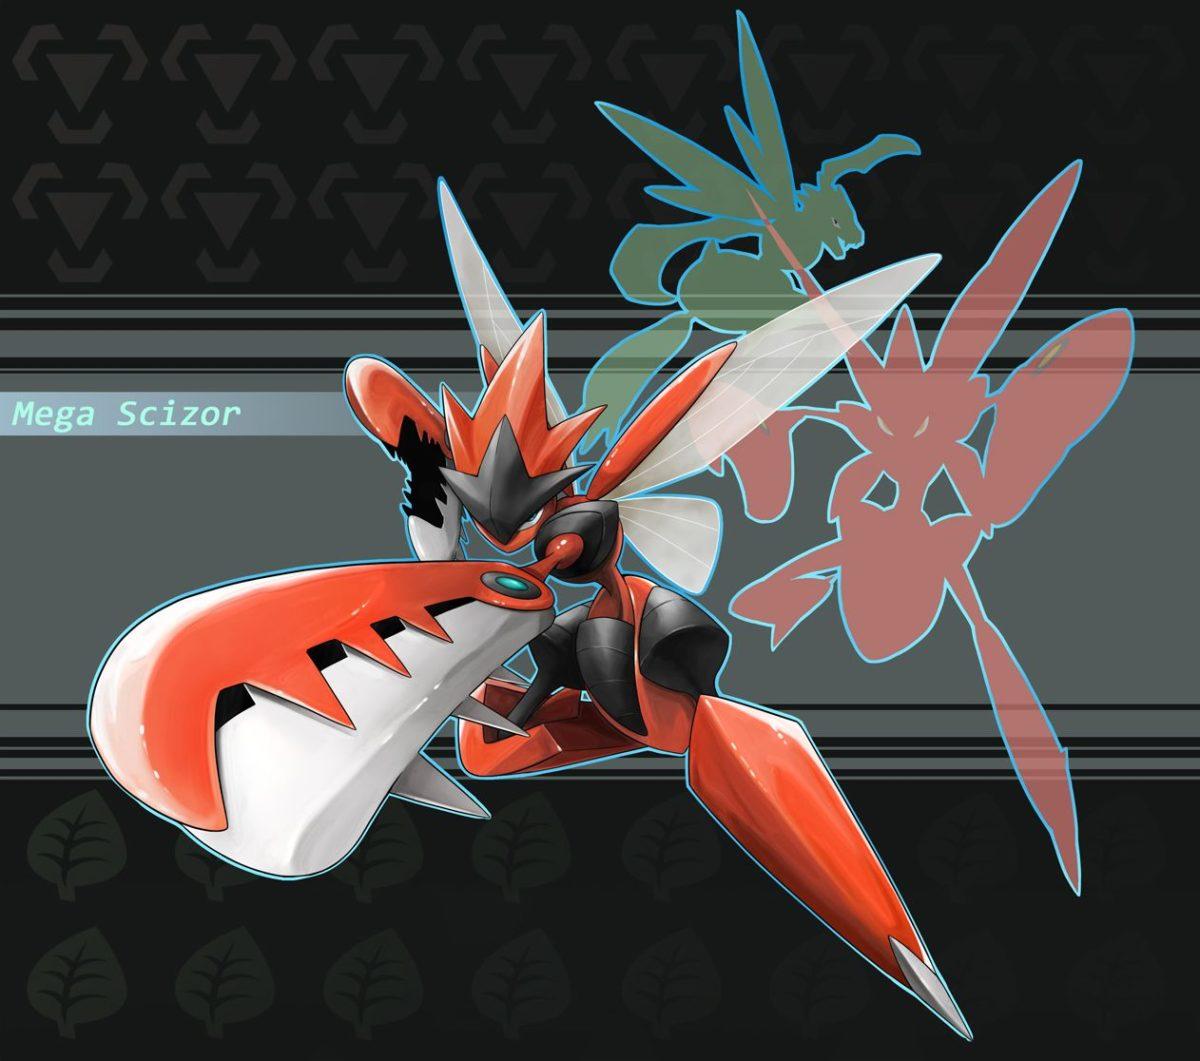 Image – 761824] | Pokémon | Know Your Meme